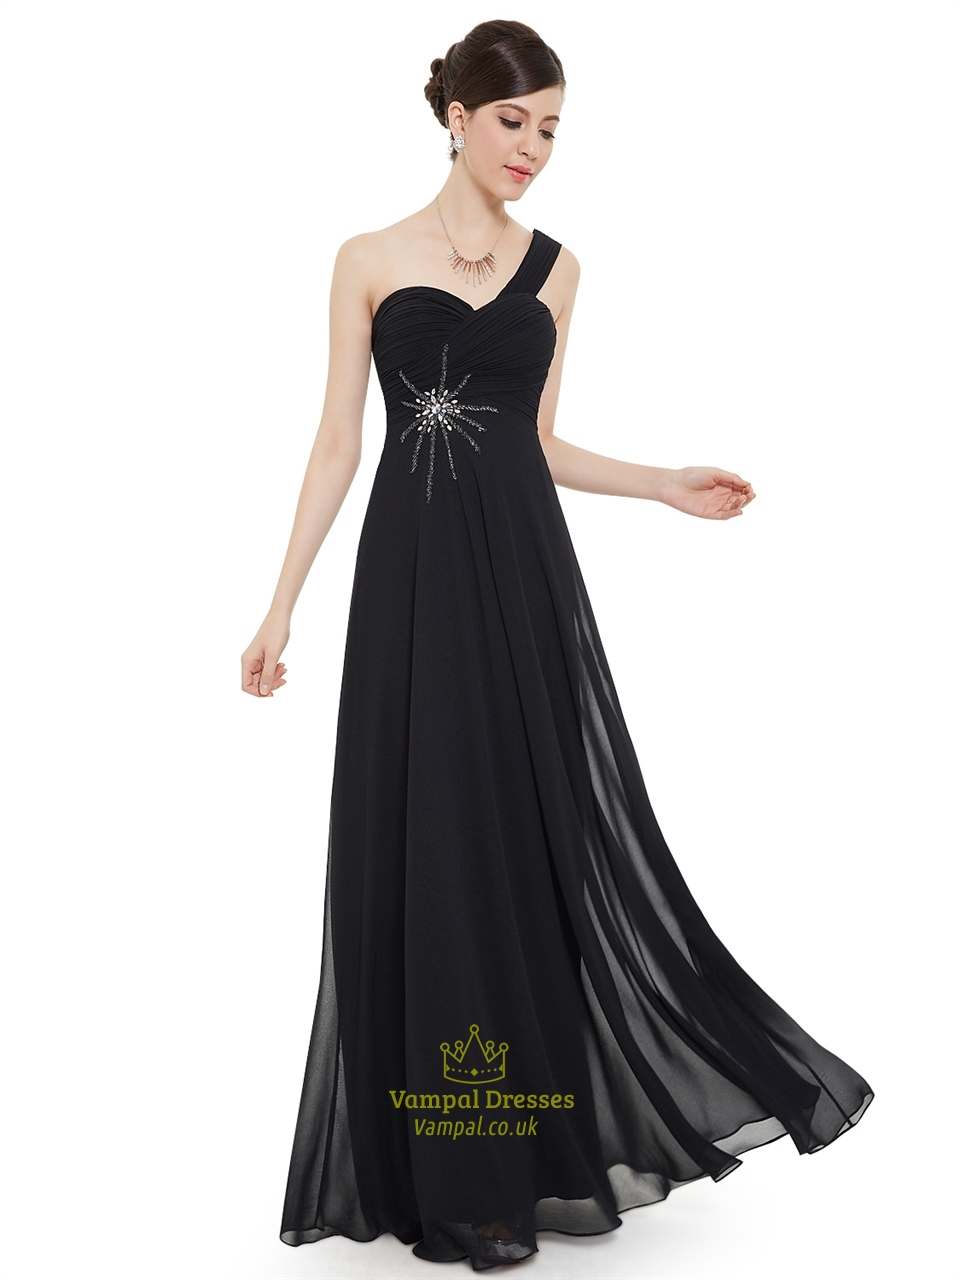 Black Chiffon One Shoulder Long Bridesmaid Dress With